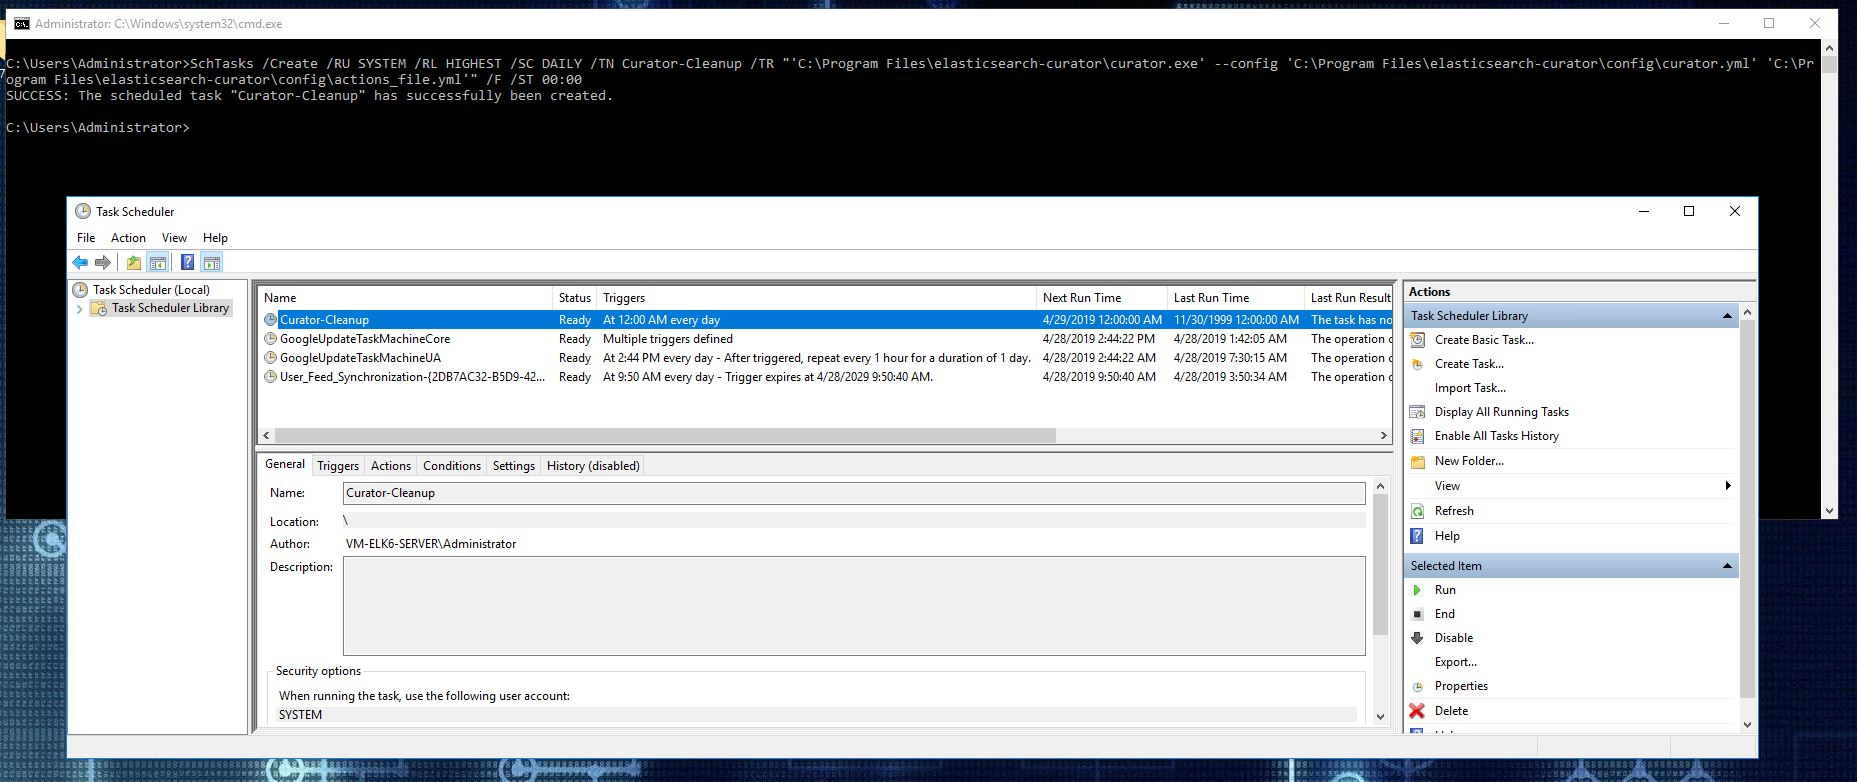 Installing ELK 7 (Elasticsearch, Logstash and Kibana) - Windows